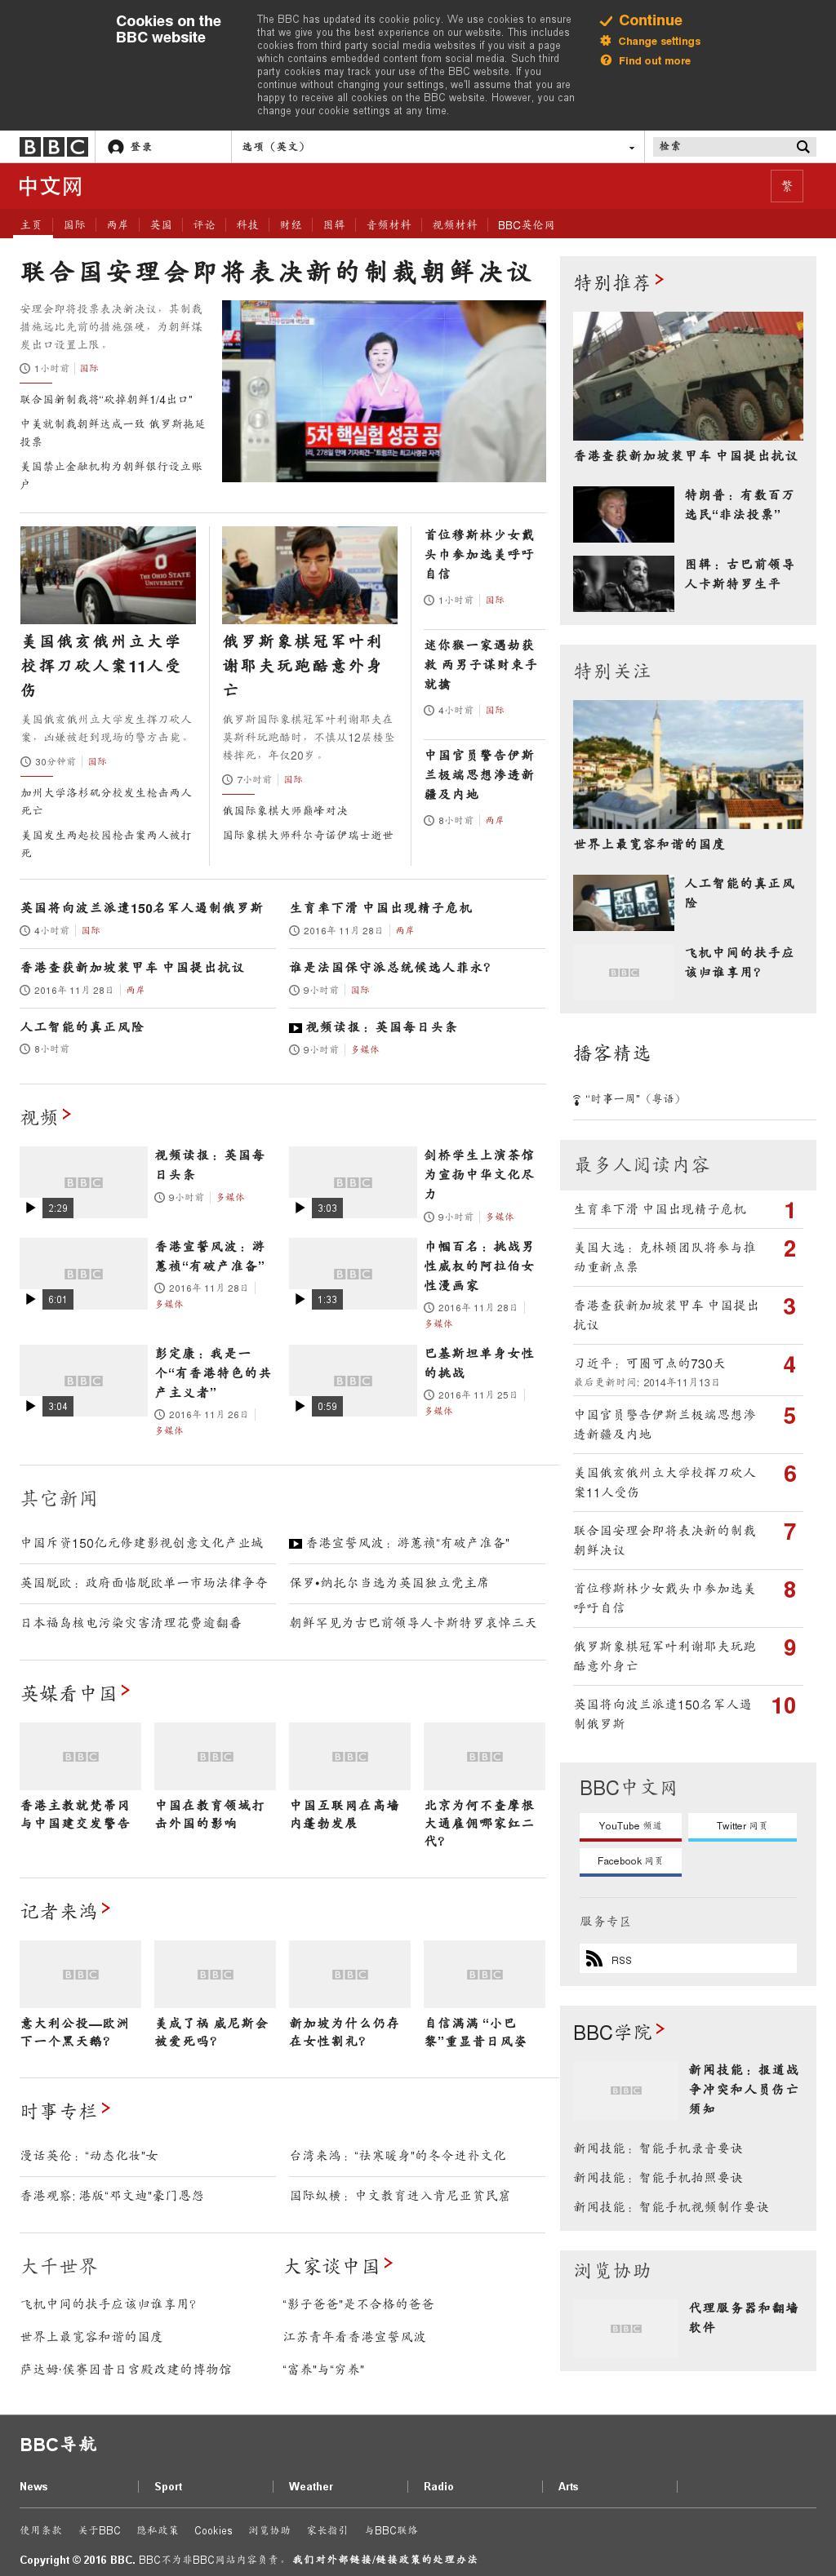 BBC (Chinese) at Tuesday Nov. 29, 2016, midnight UTC